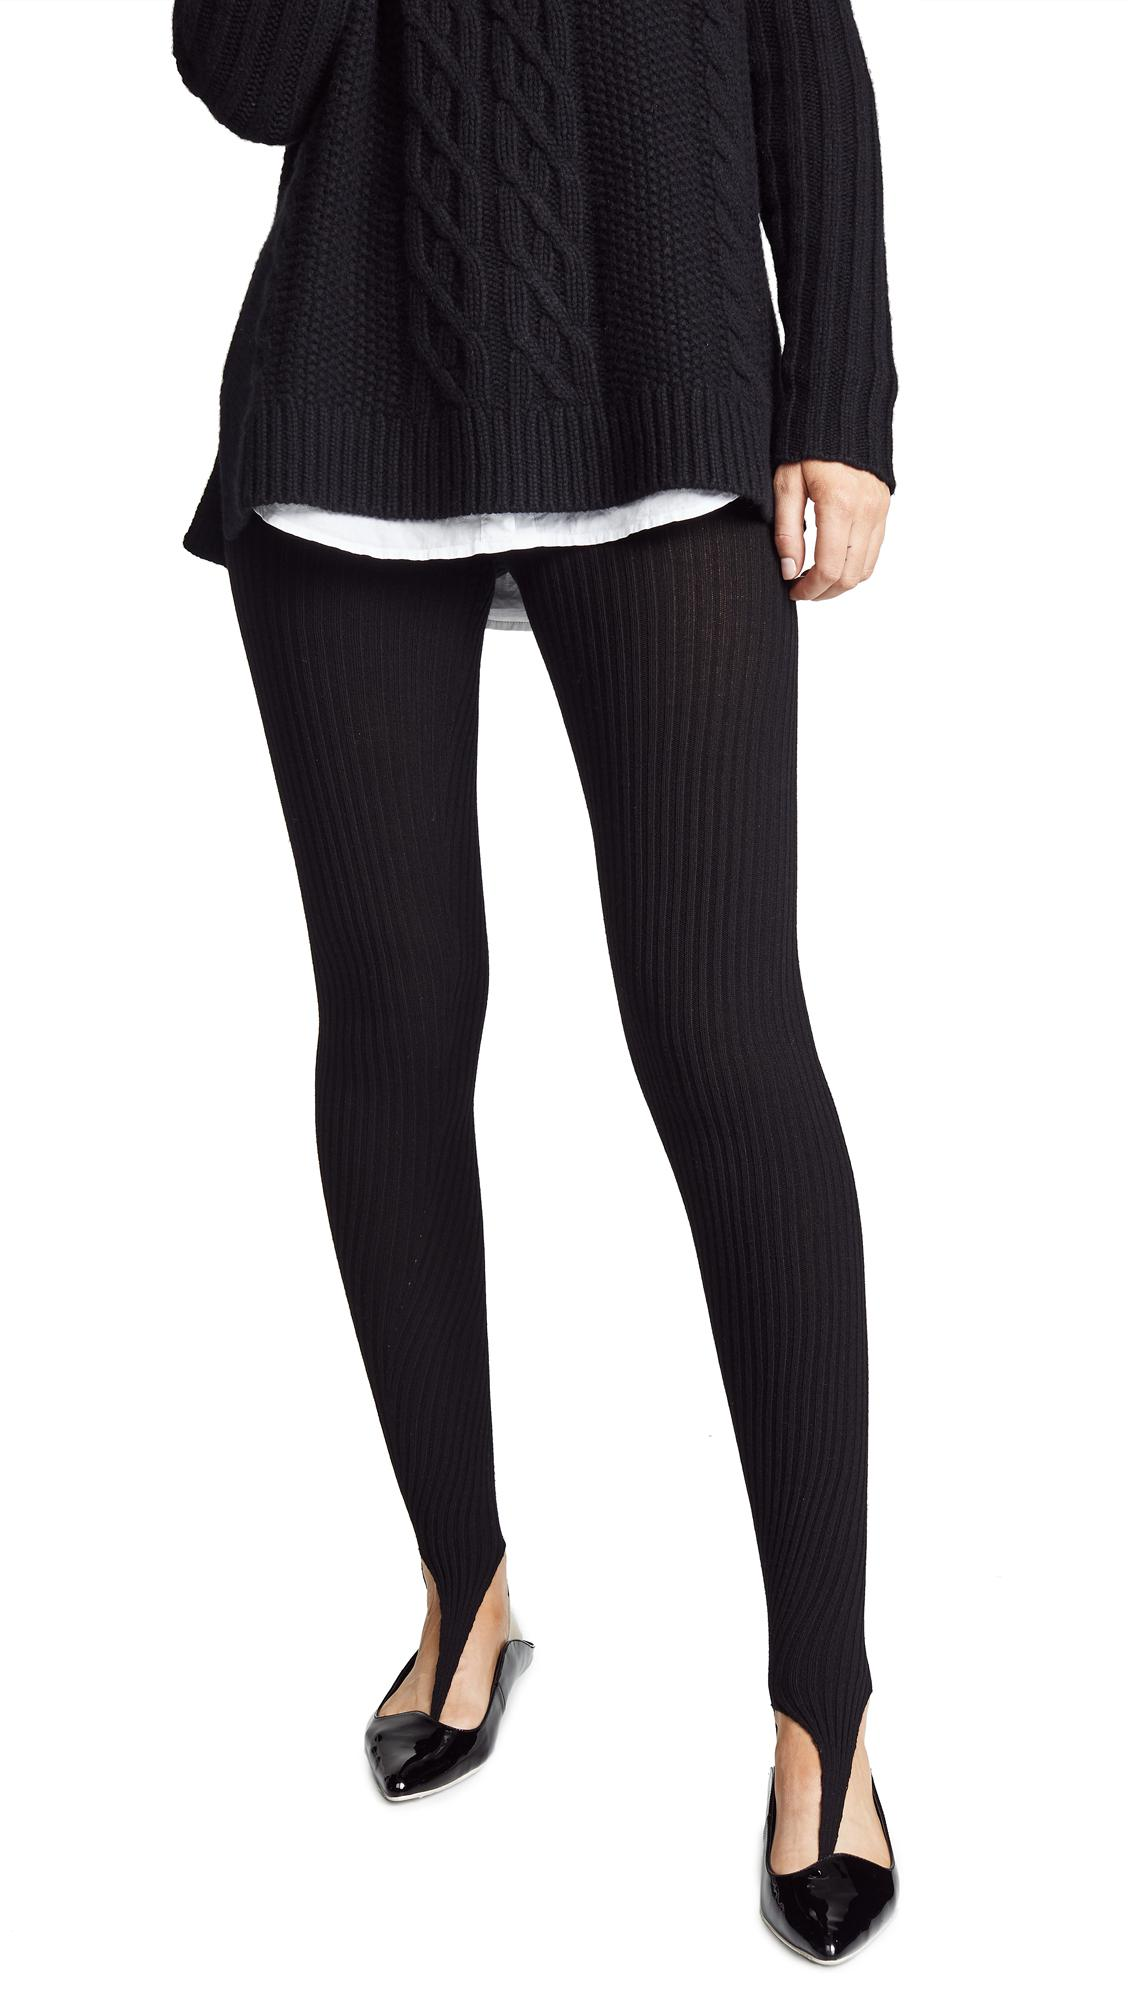 Lyst - Jacquemus Collants Leggings in Black 0309c91bf8a